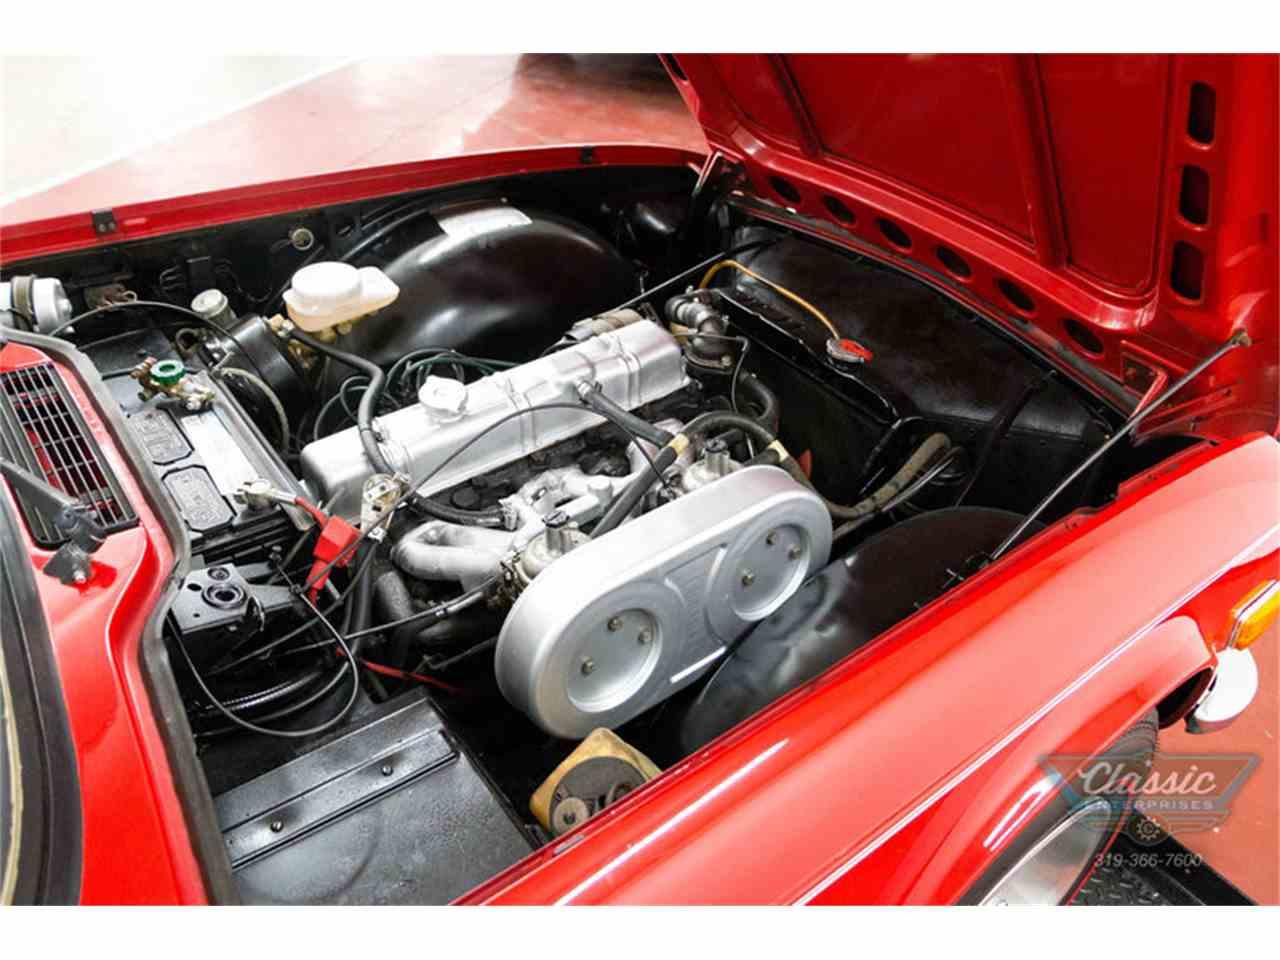 Large Picture of '73 Triumph TR6 located in Cedar Rapids Iowa - I82S